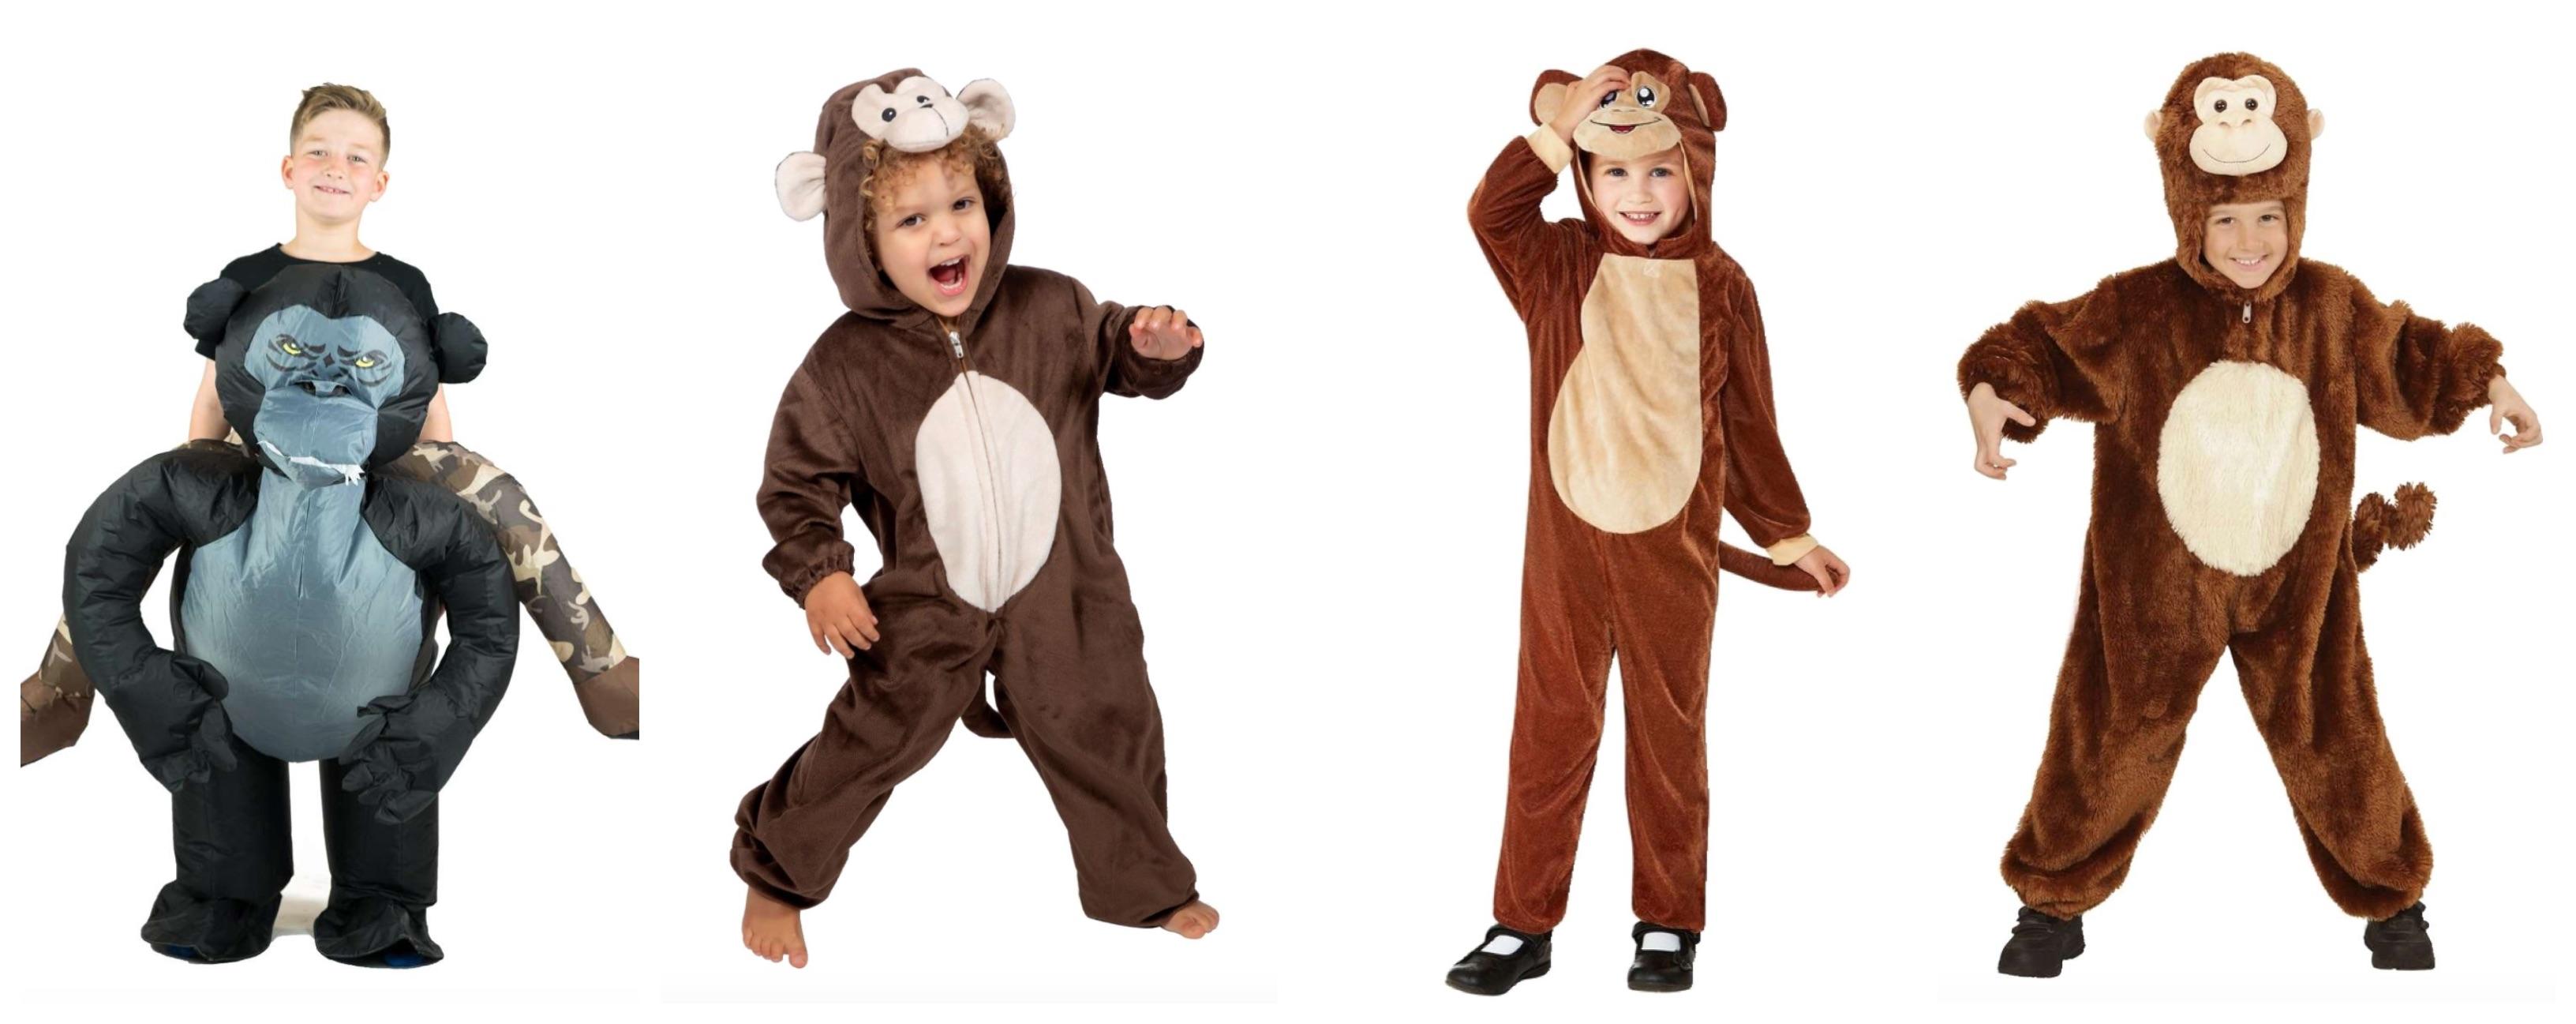 abe kostume til børn - abe kostume til børn og baby